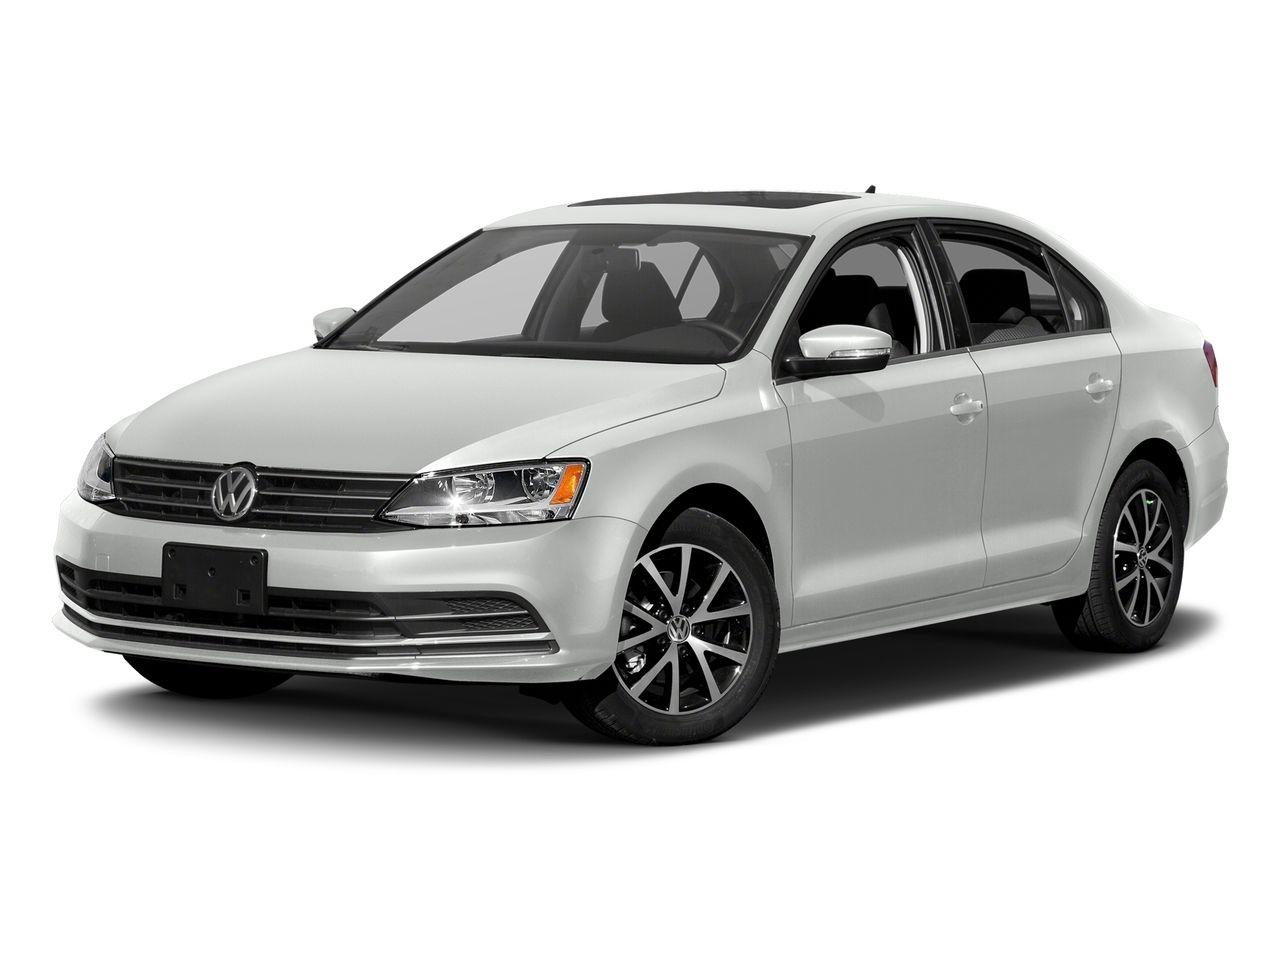 2017 Volkswagen Jetta Sedan Image